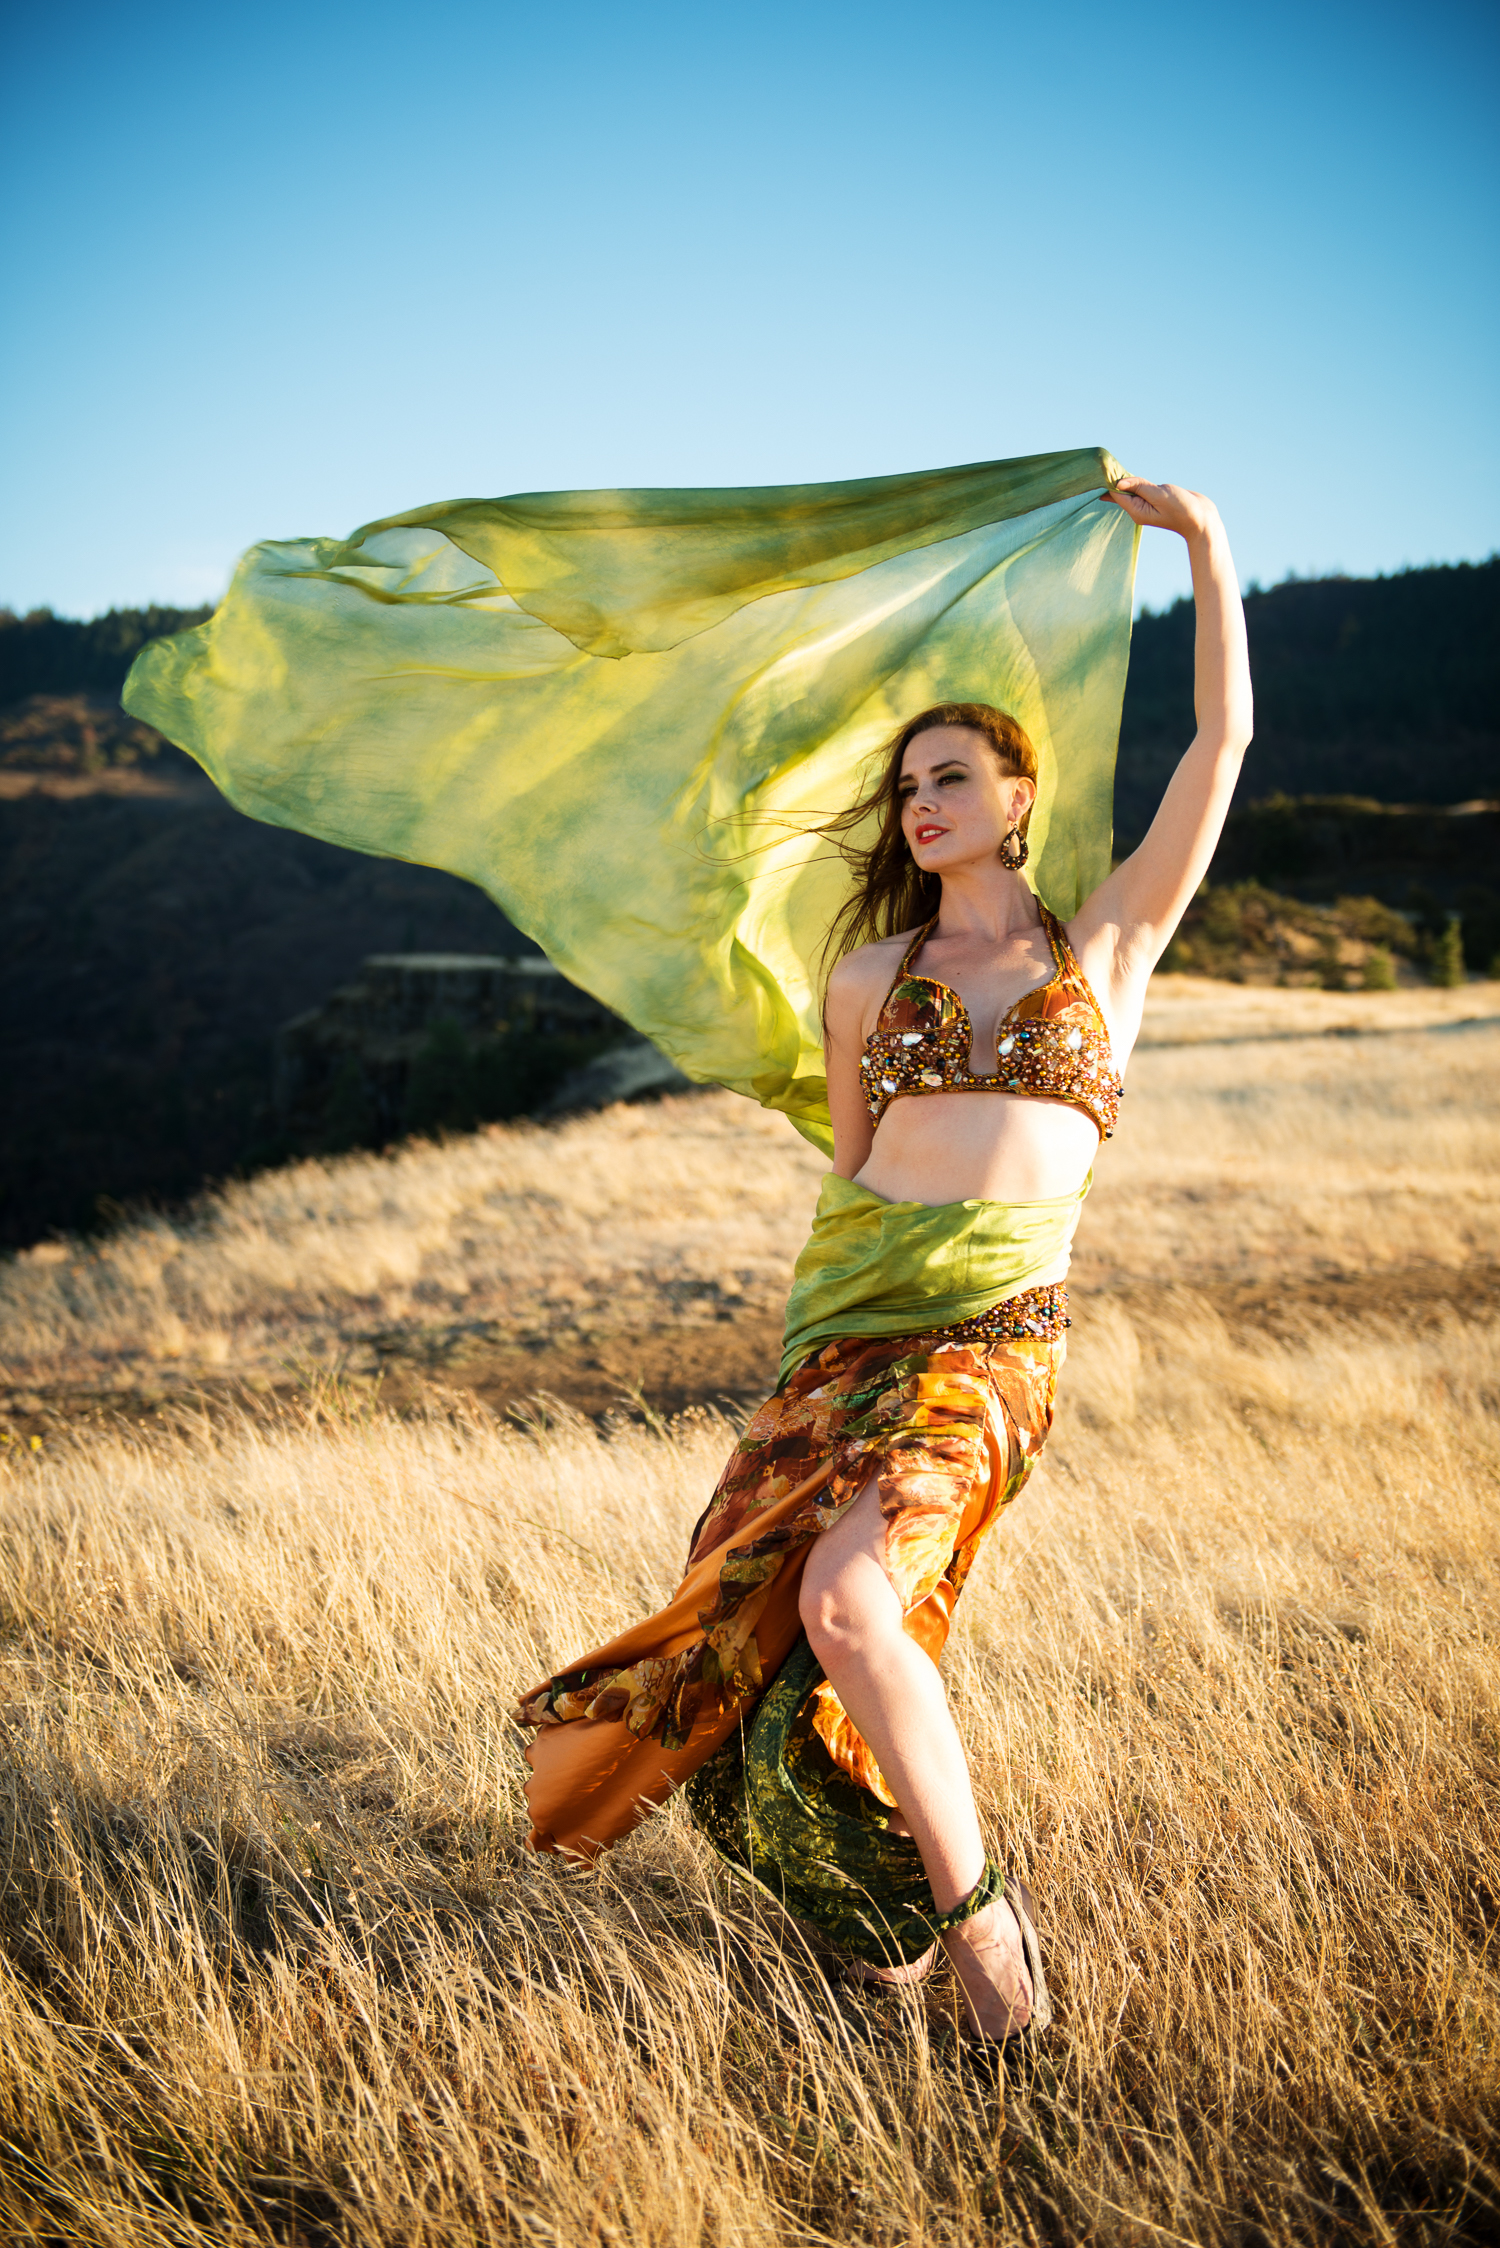 EmilieLauren-Znama-Dance-5.jpg